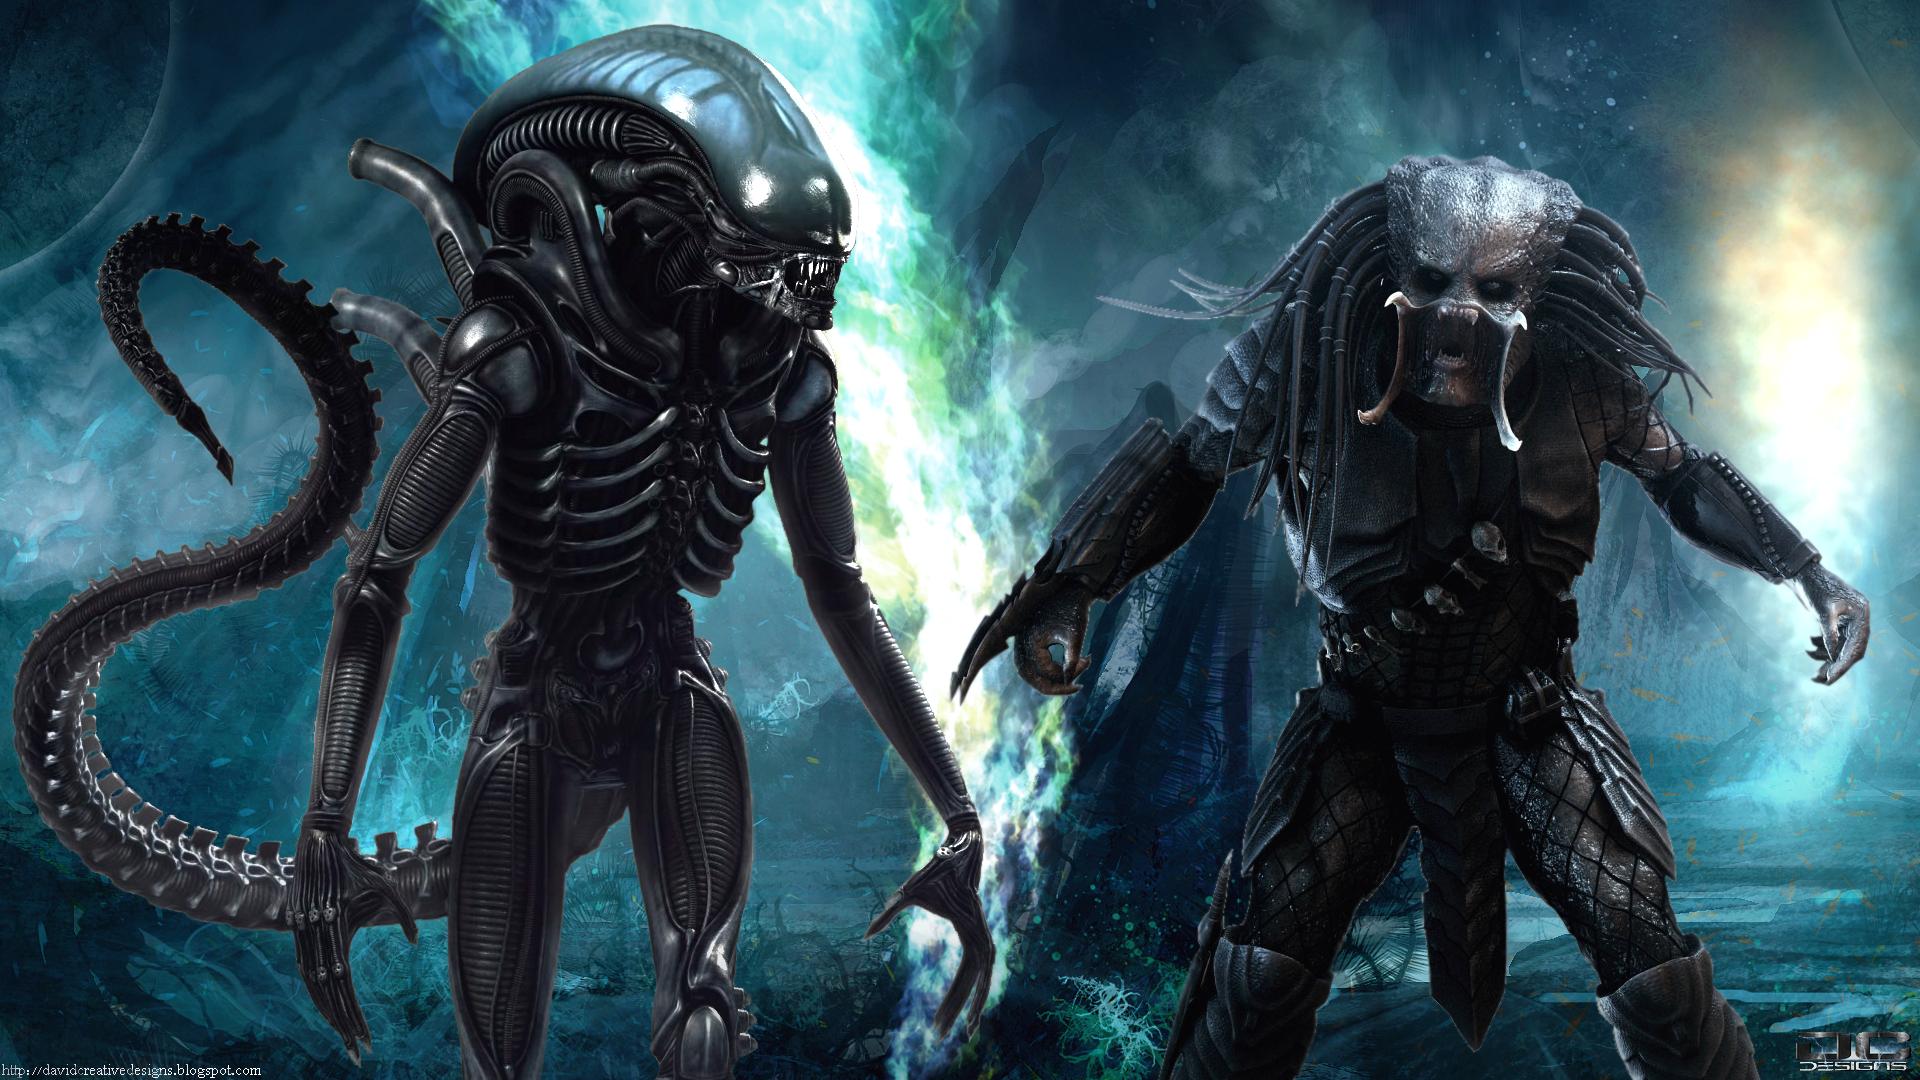 Alien Vs Predator Hd Wallpapers: Alien Vs Predator Full HD Wallpaper And Background Image